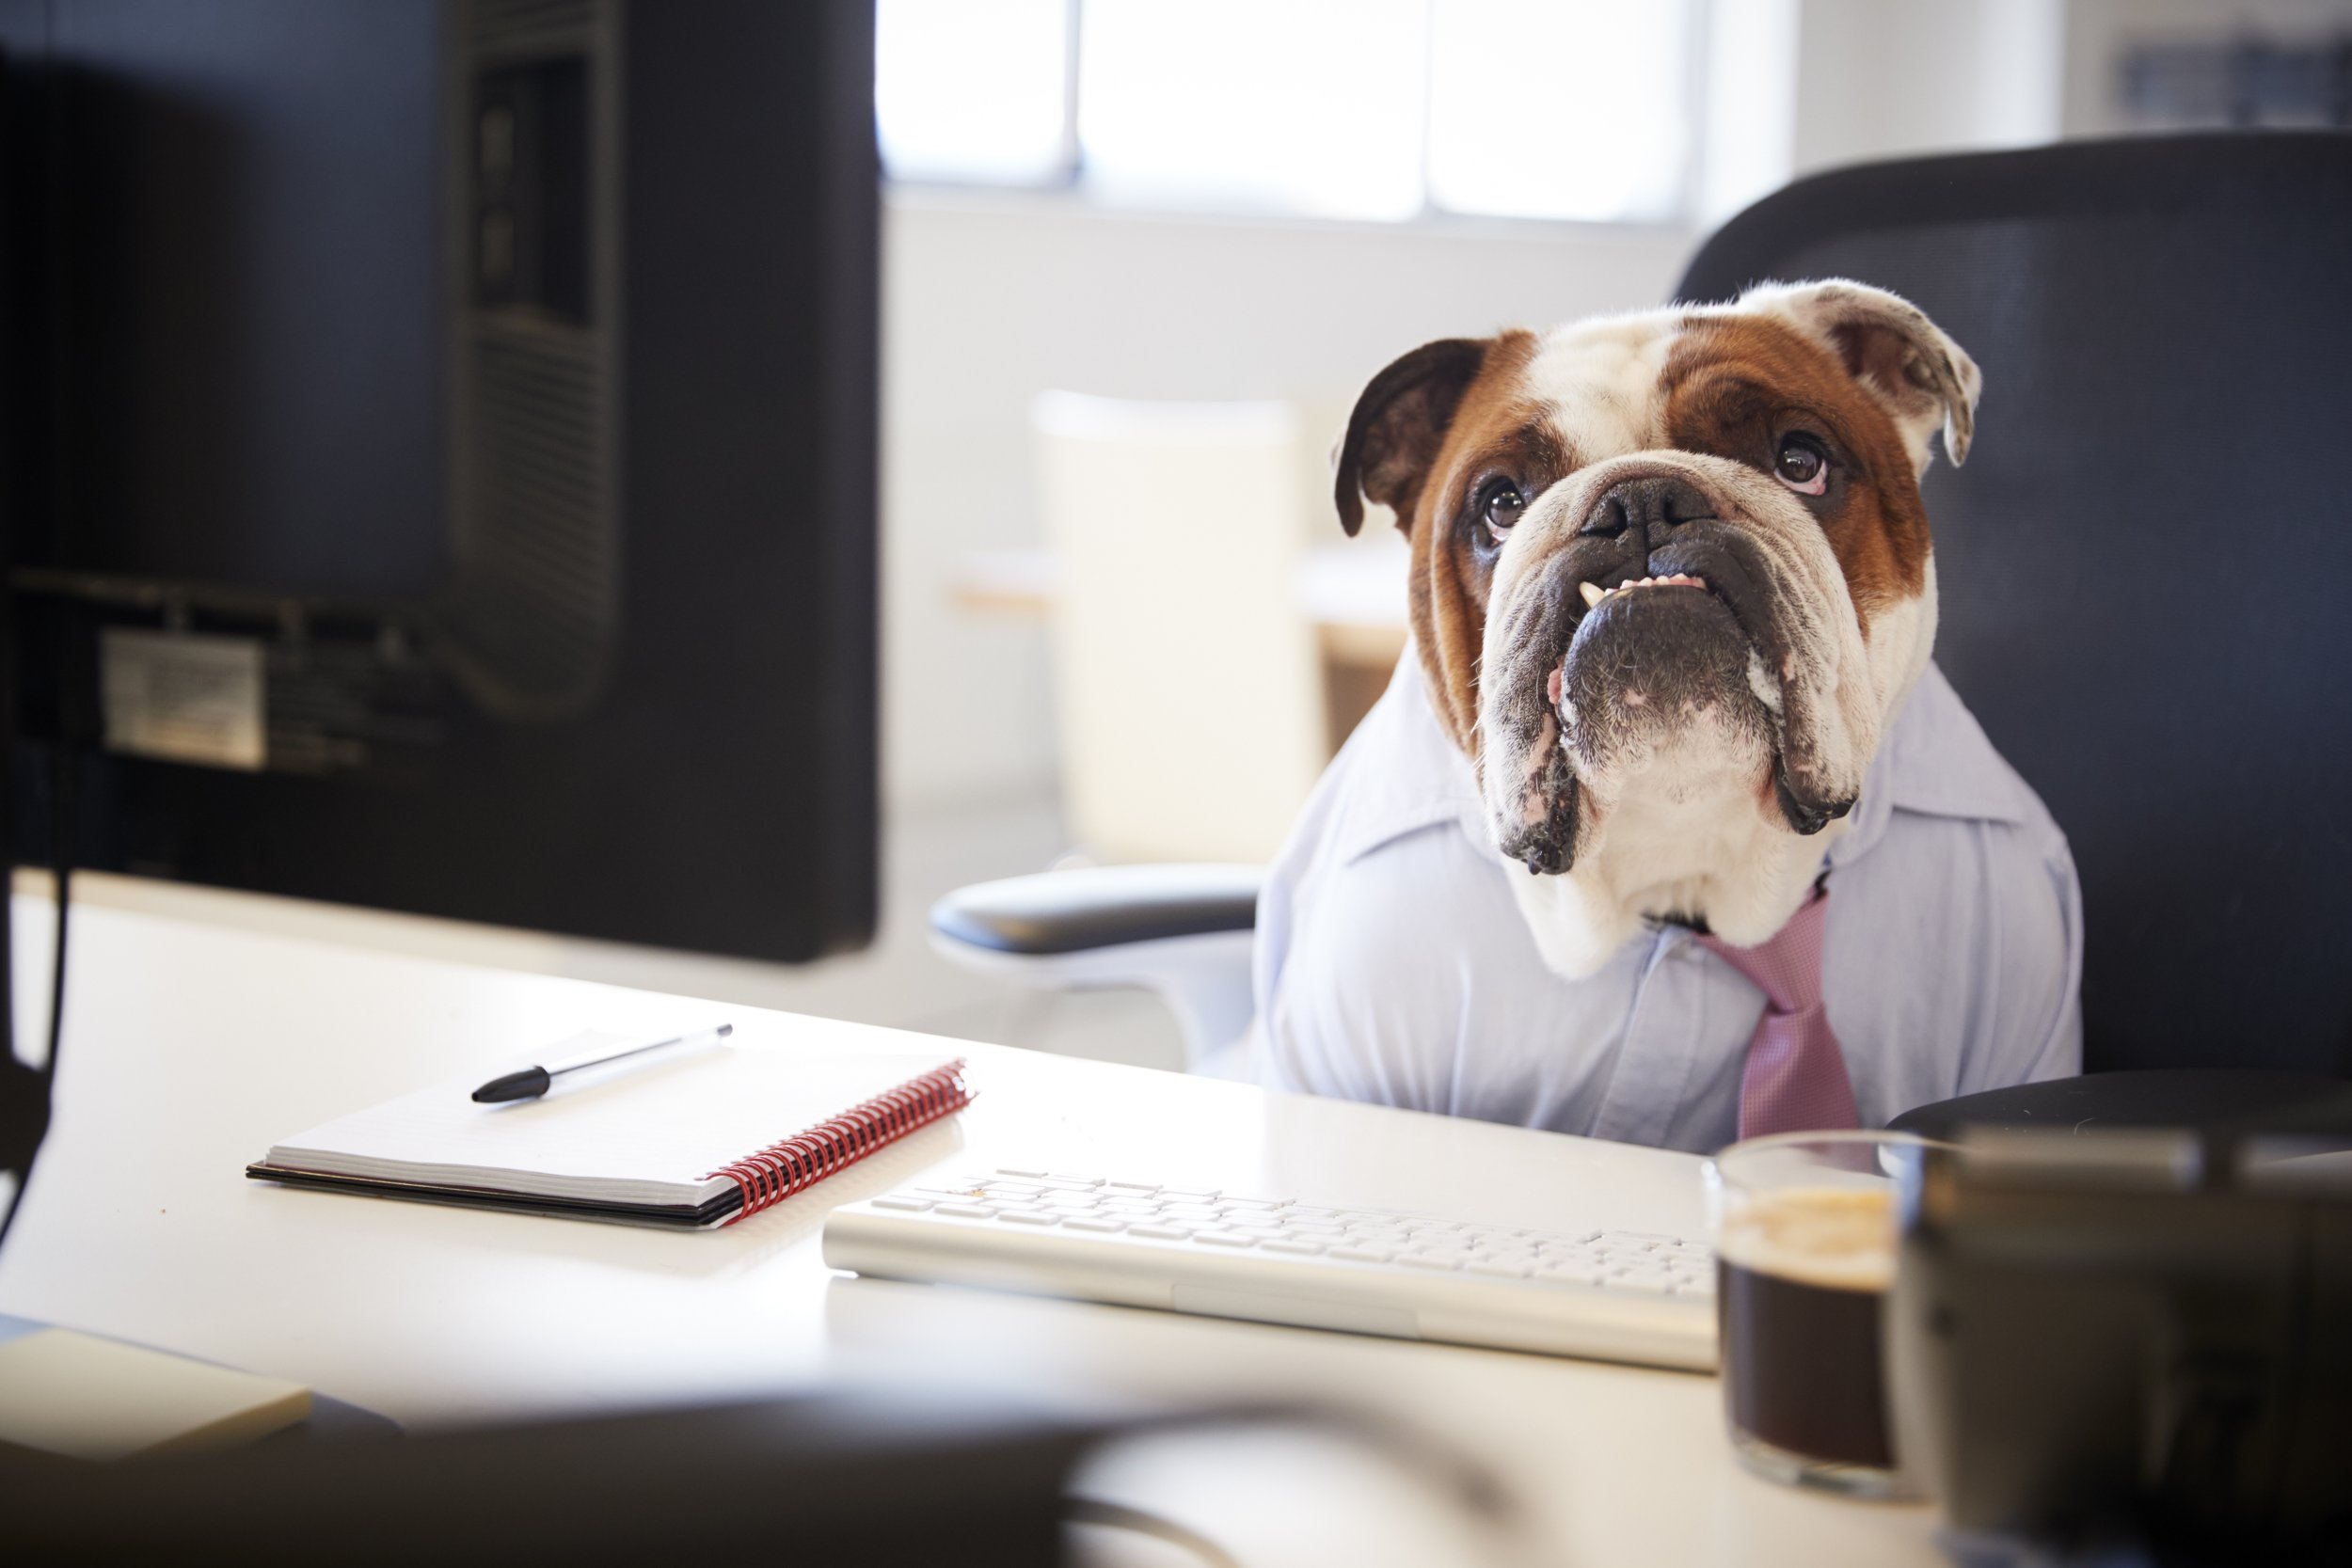 Dog at Work Getty